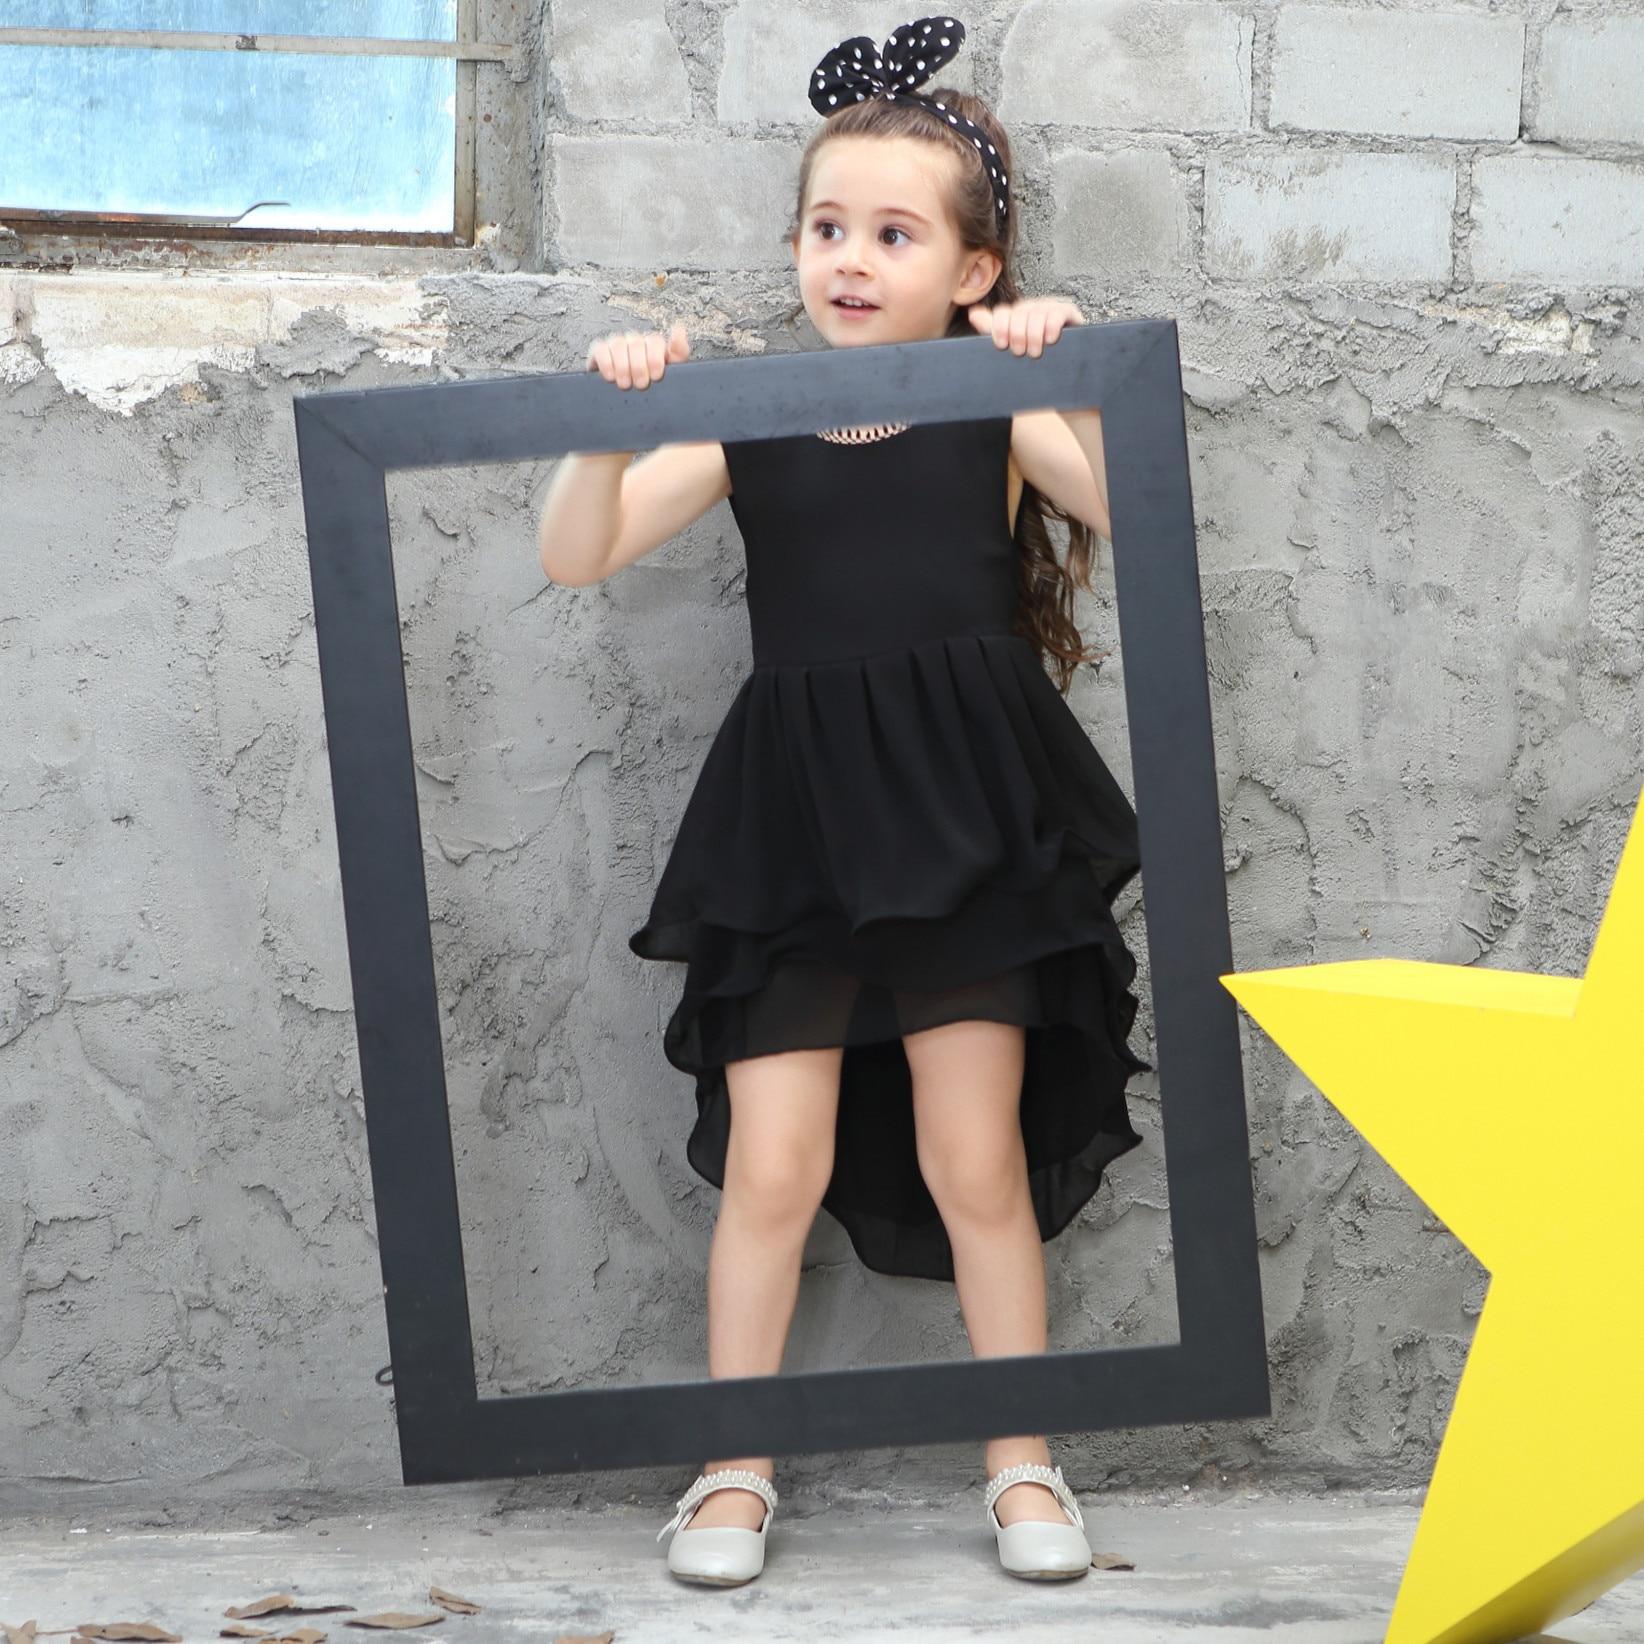 Black dress for baby girl - Kids Evening Dress Baby Girls Black Irregular Party Dresses Girl Sleeveless Princess Dress Costume Children Summer